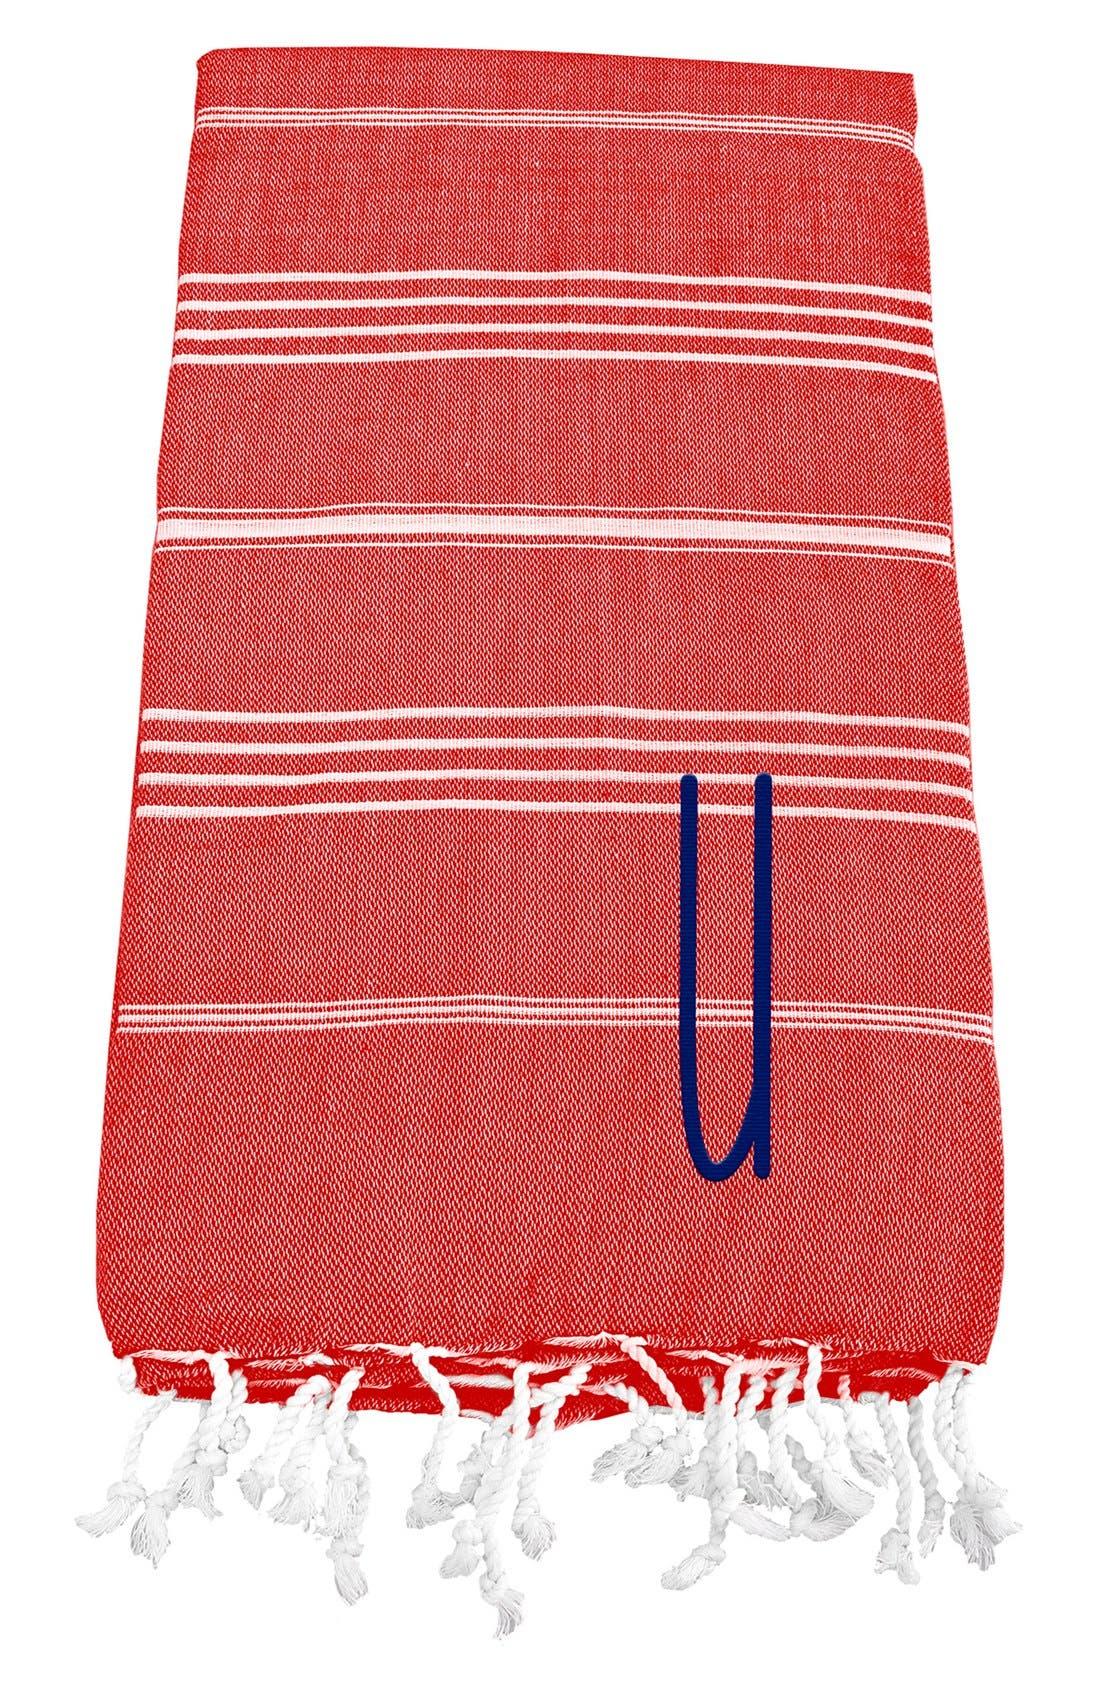 Monogram Turkish Cotton Towel,                             Main thumbnail 130, color,